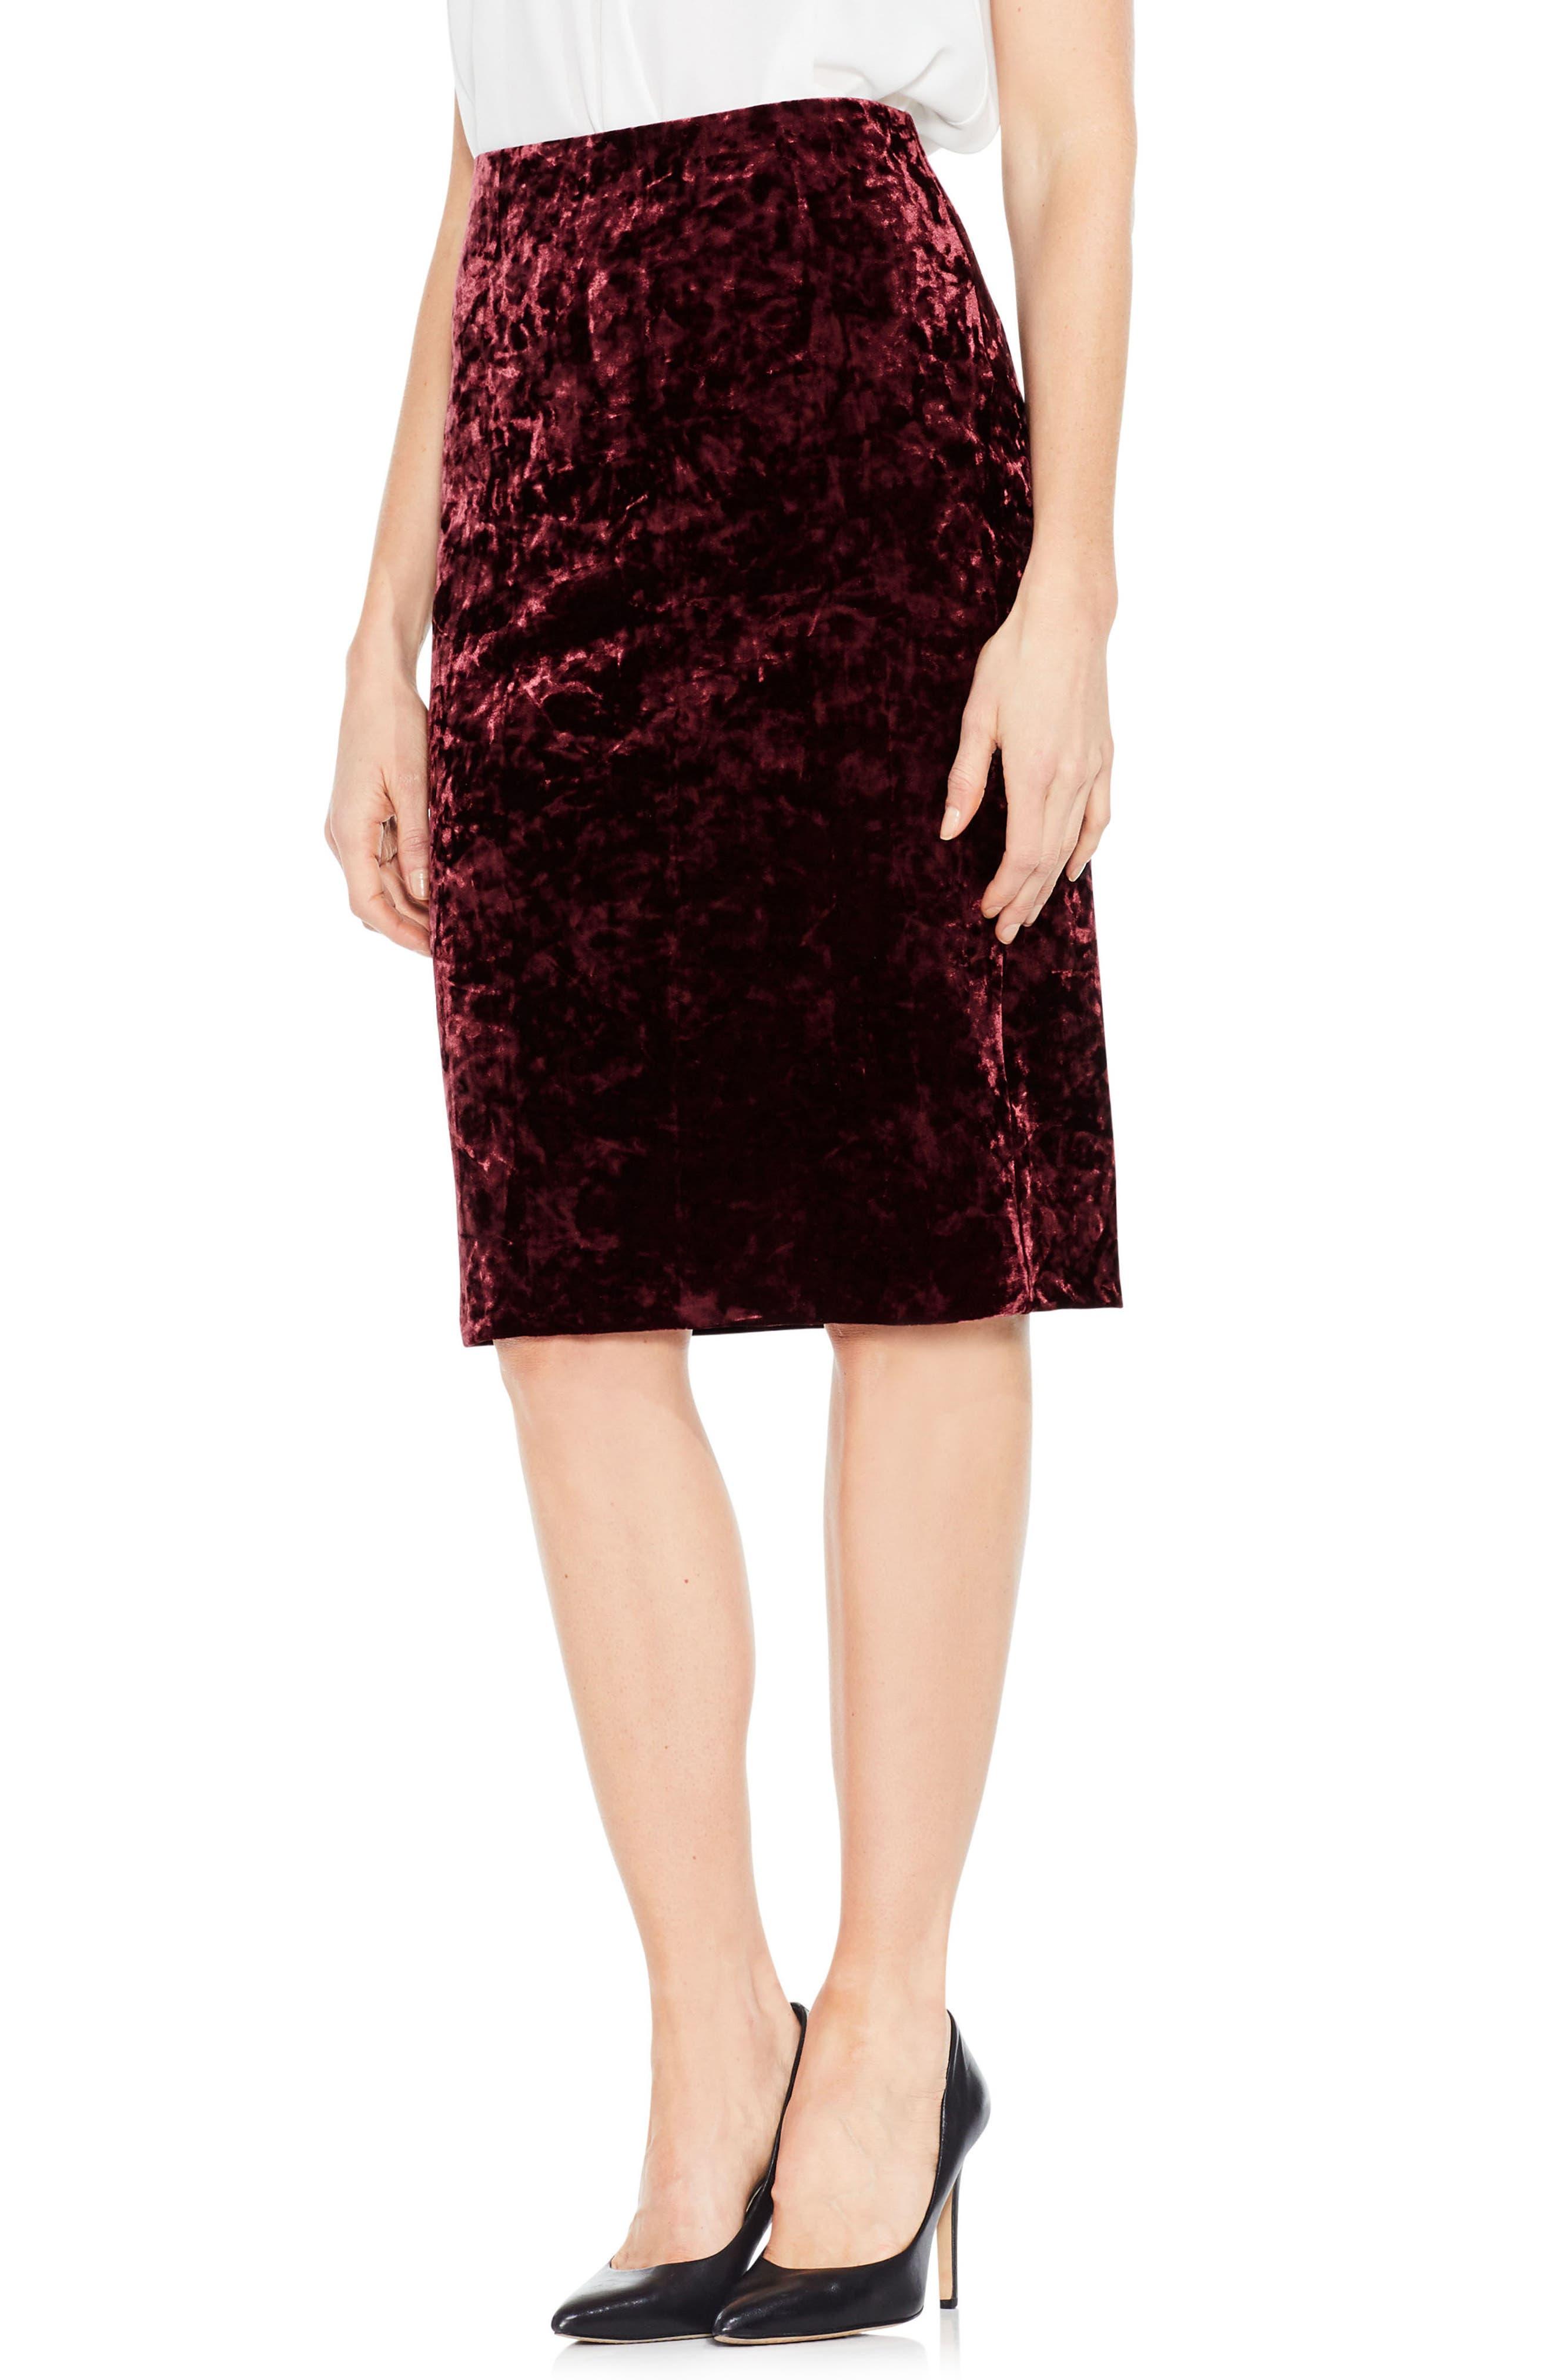 Alternate Image 1 Selected - Vince Camuto Crushed Velvet Pencil Skirt